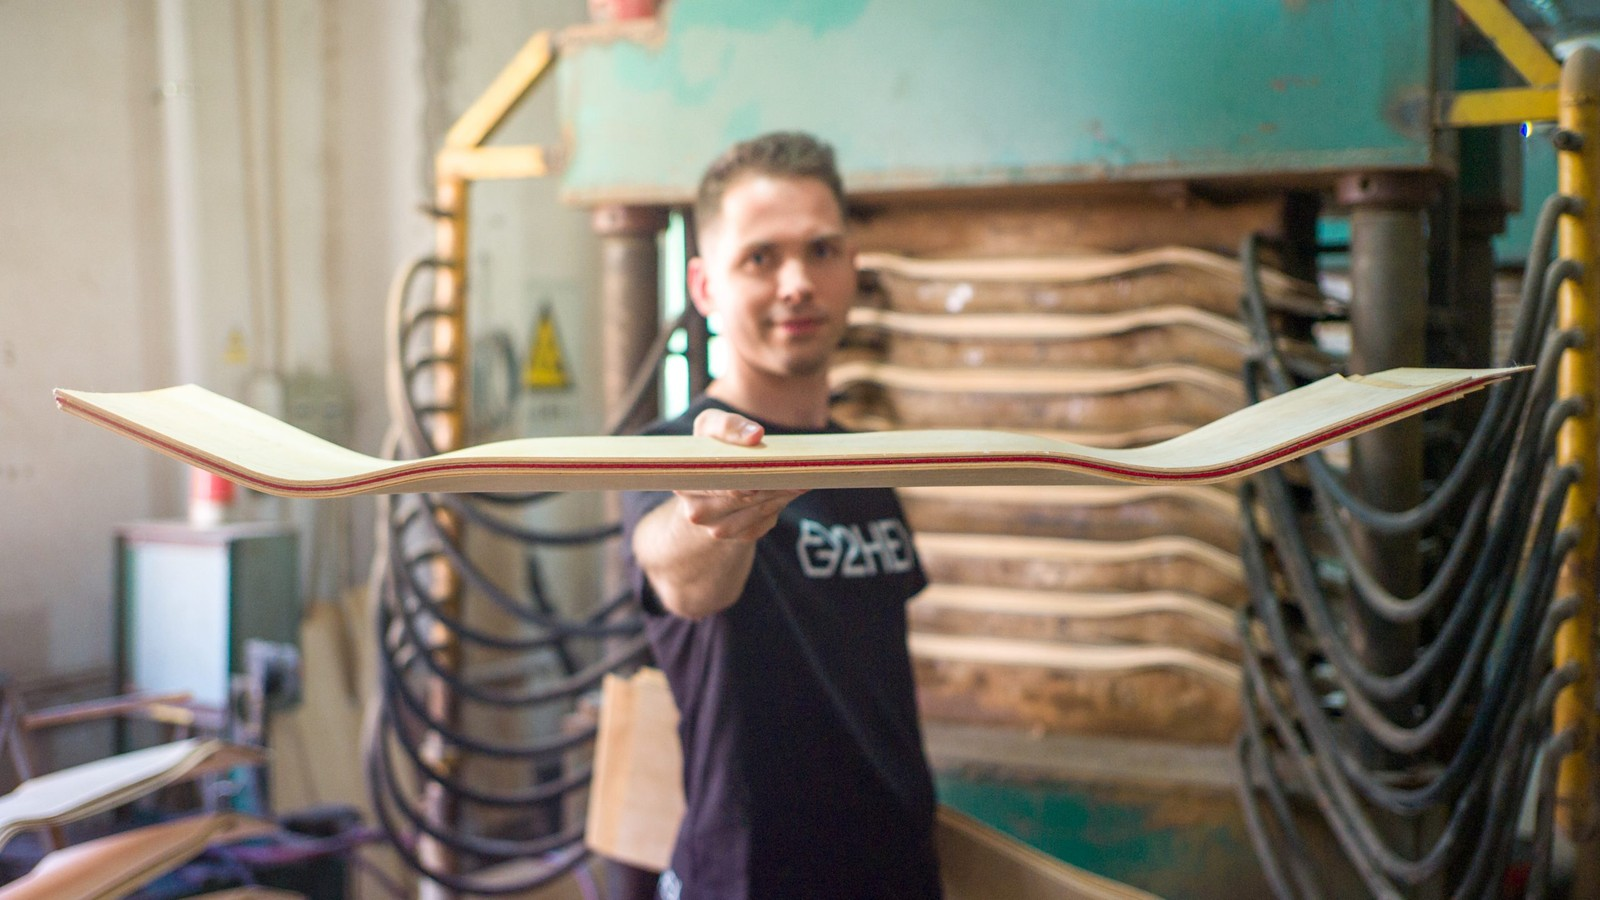 2HEX Is Revolutionizing Custom Skateboard Production